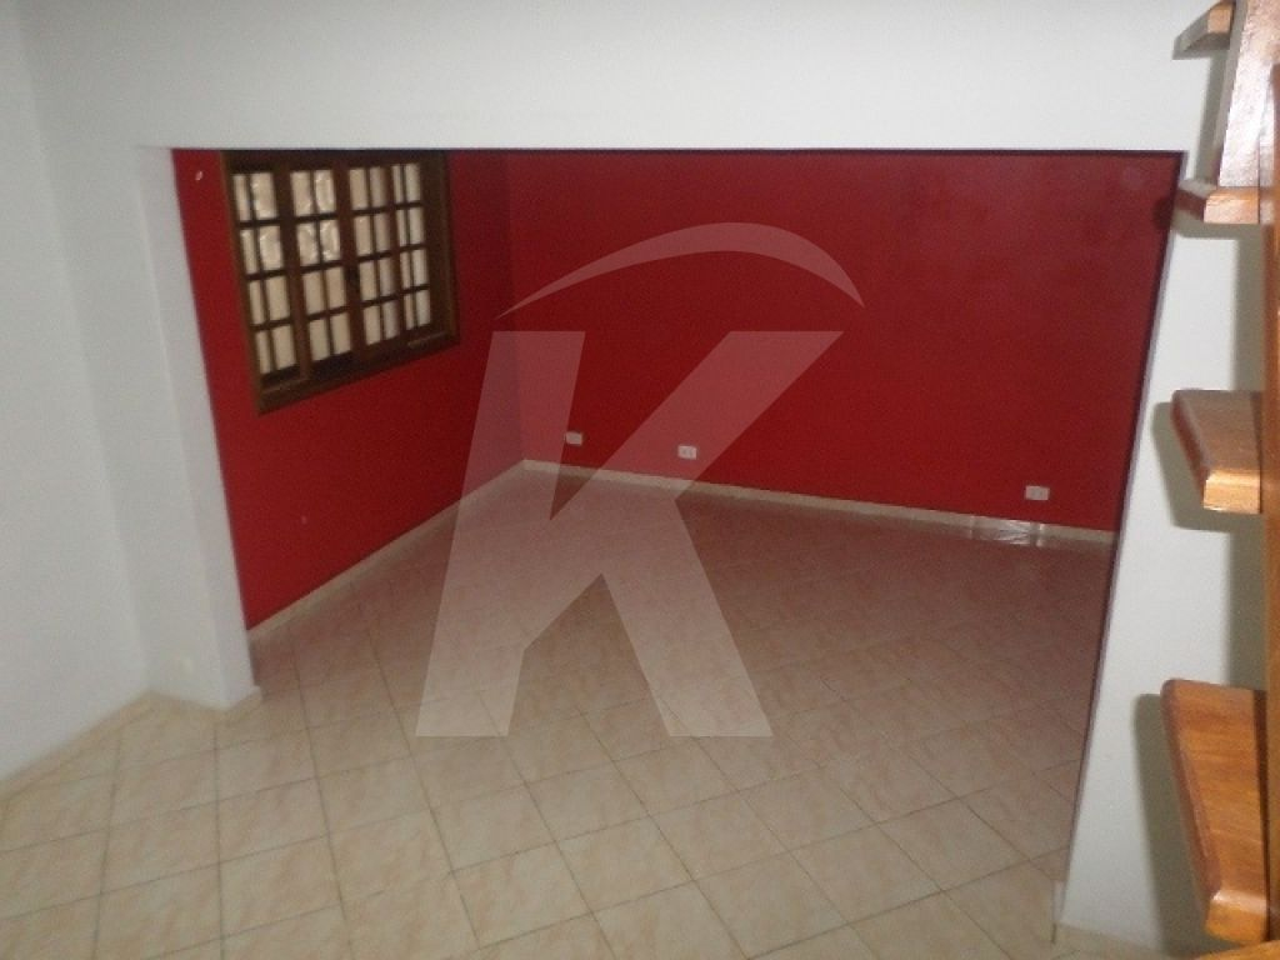 Sobrado Tucuruvi - 3 Dormitório(s) - São Paulo - SP - REF. KA3692